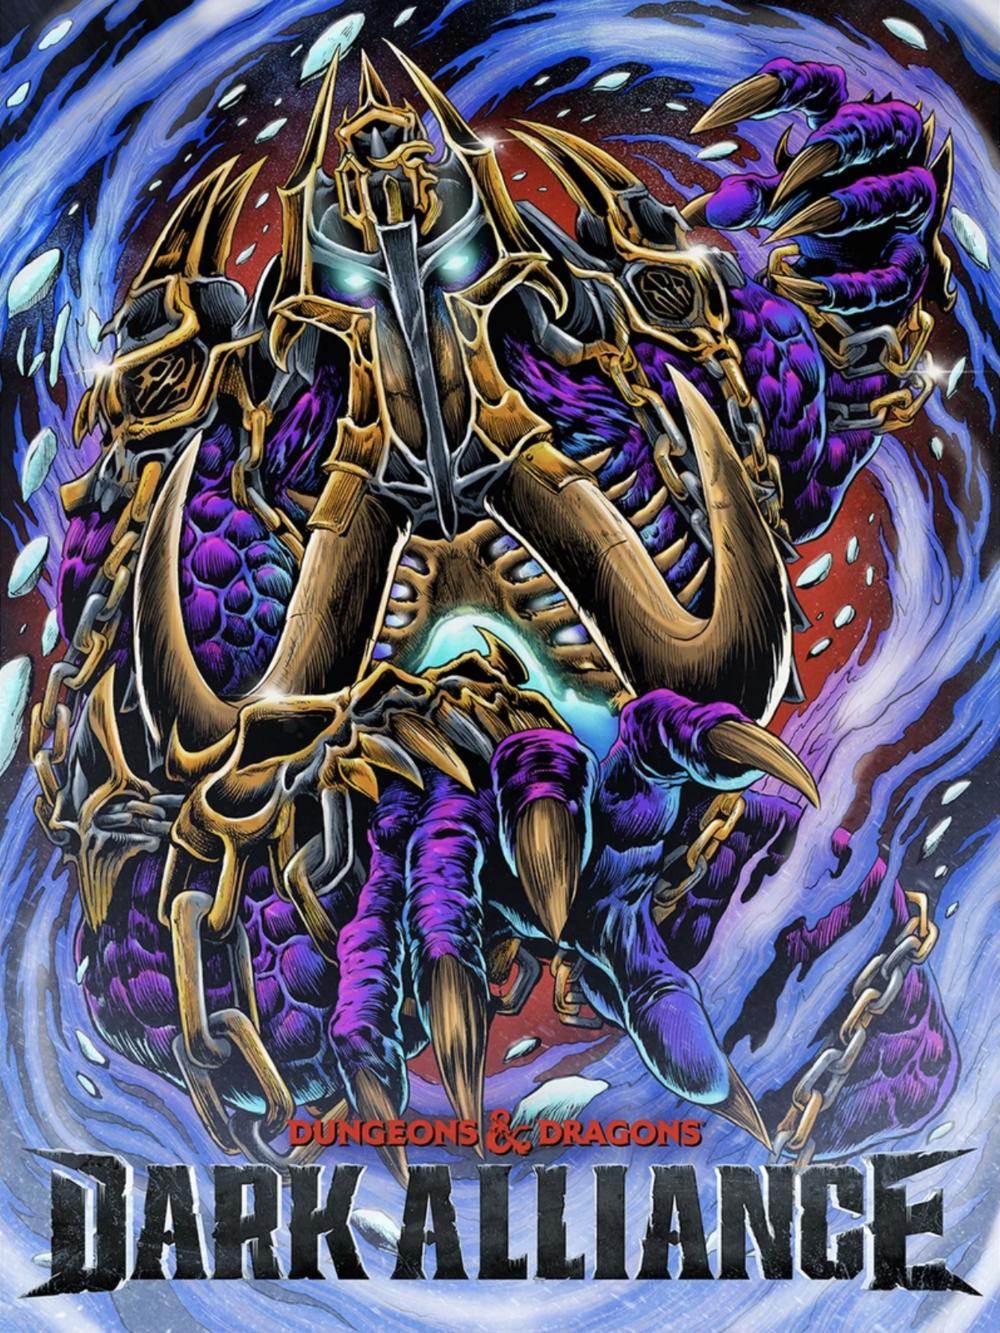 new-dungeons-dragons-dark-alliance-poster-art-stygian-malrus